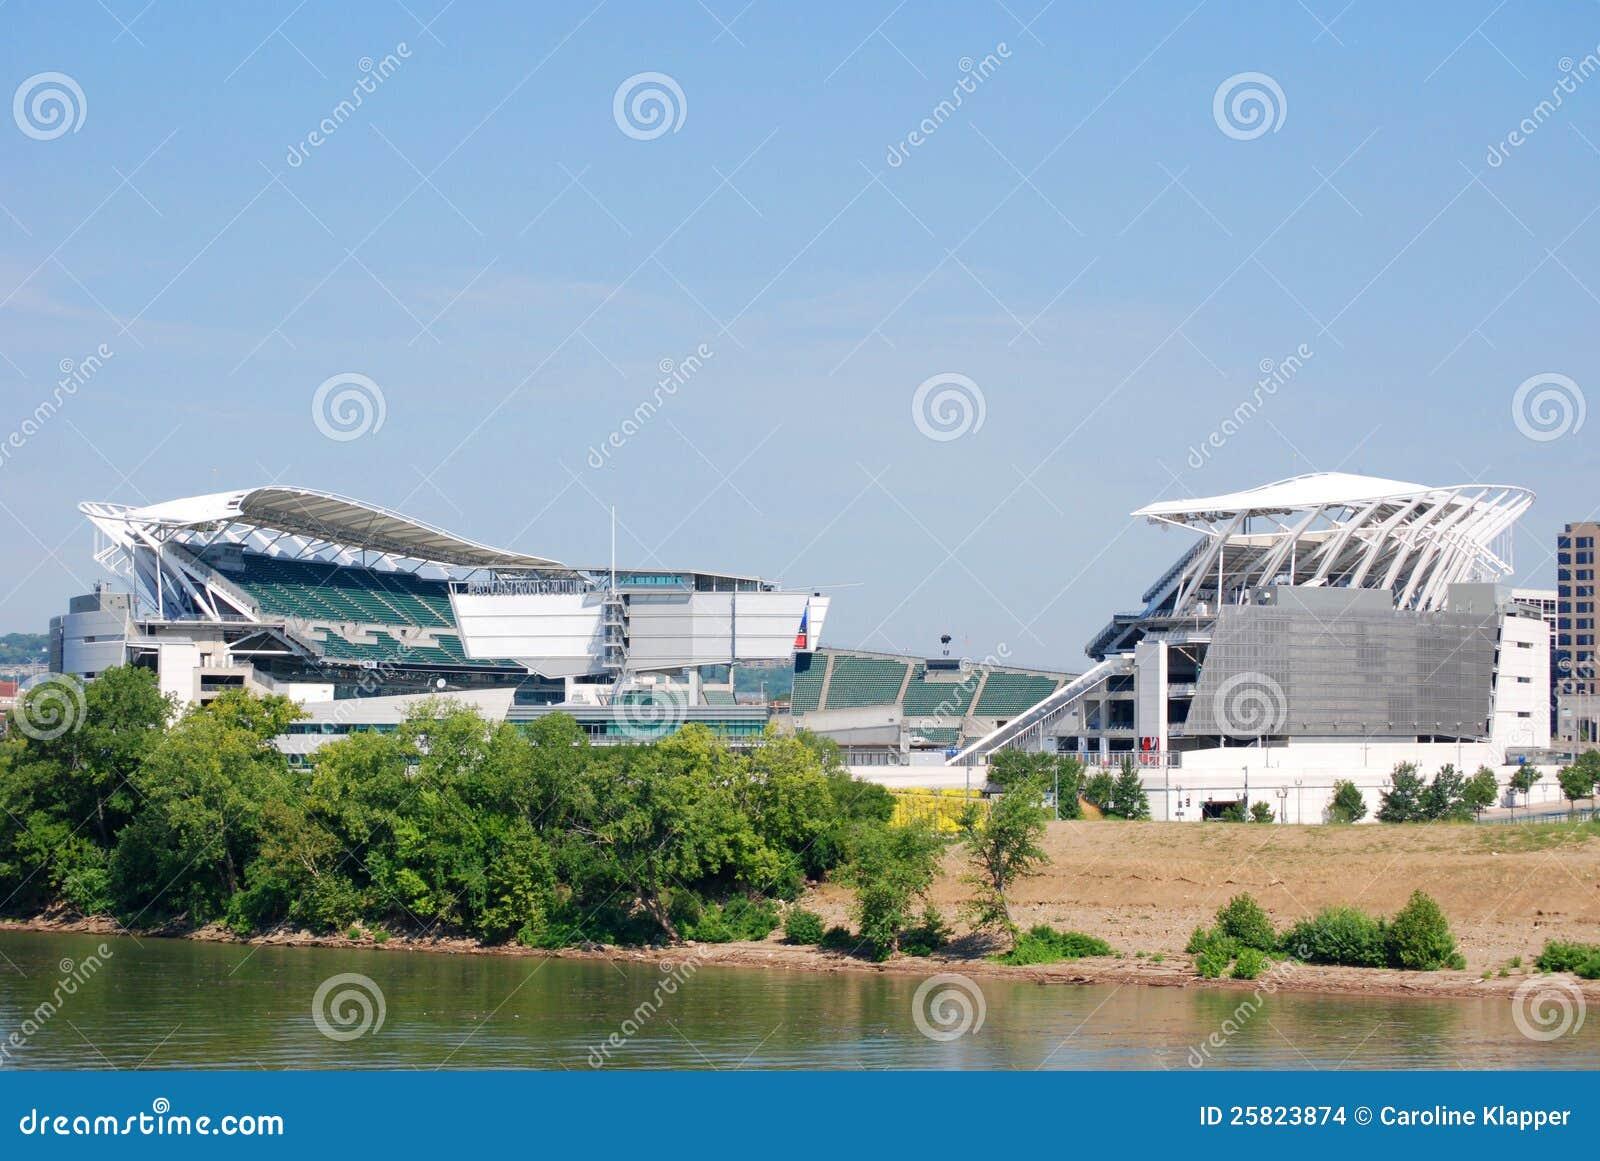 bengals football stadium editorial stock image